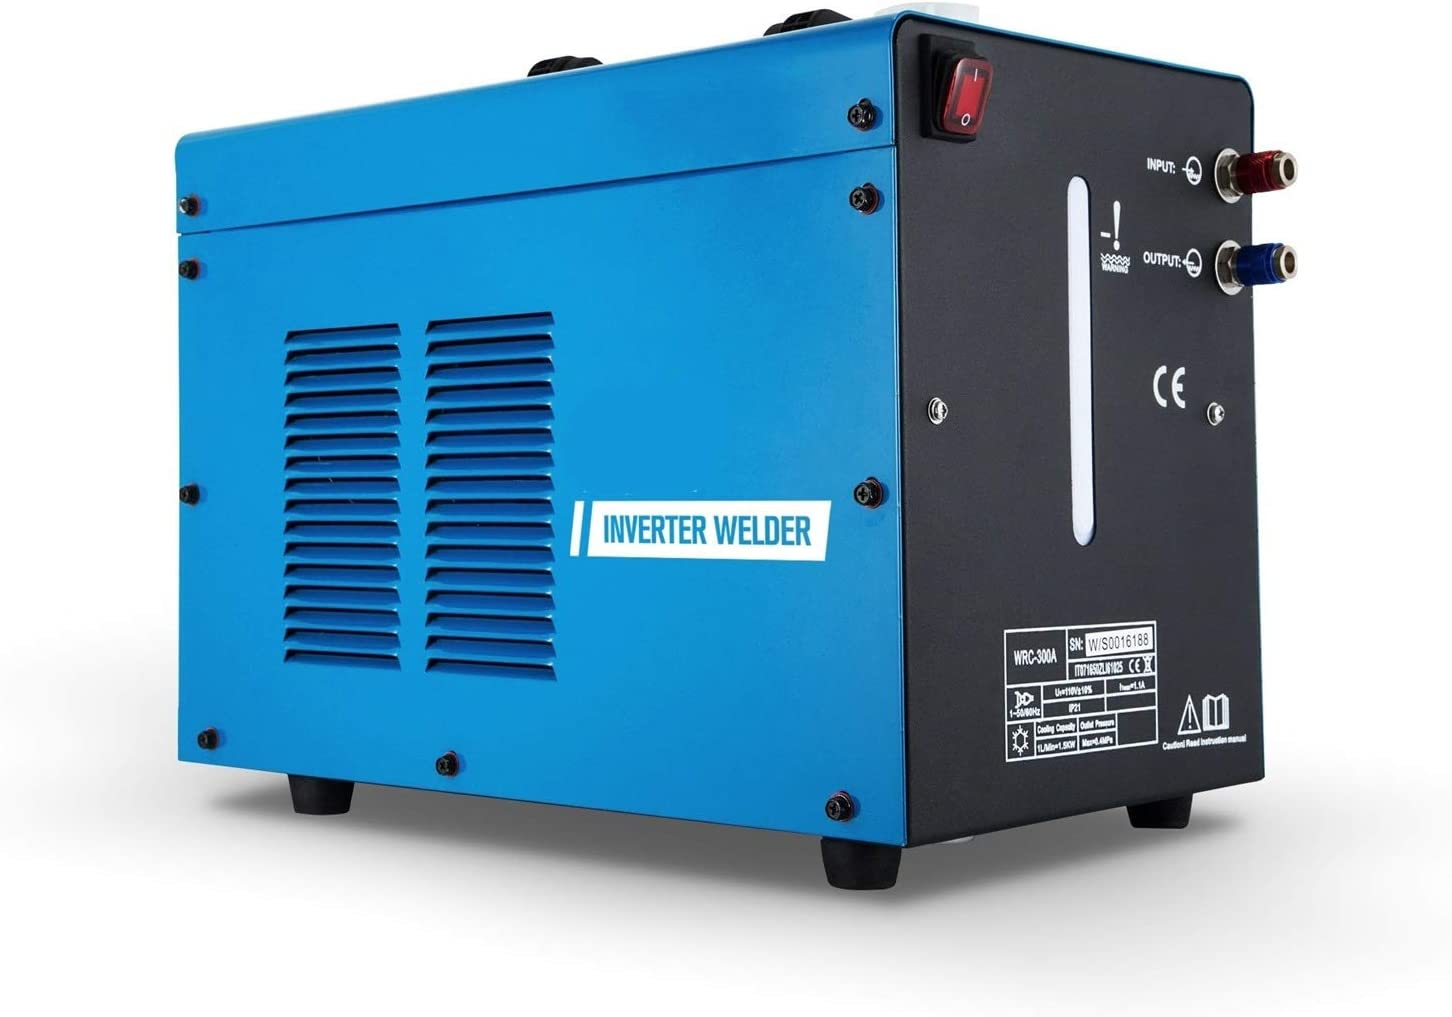 Máquina de soldadura micro TIG Inverter Welder 300AMP Water Welder Cooler TIG Welder Torch Professional Industrial Cooler Máquina de soldadura de 10 litros Pantalla digital